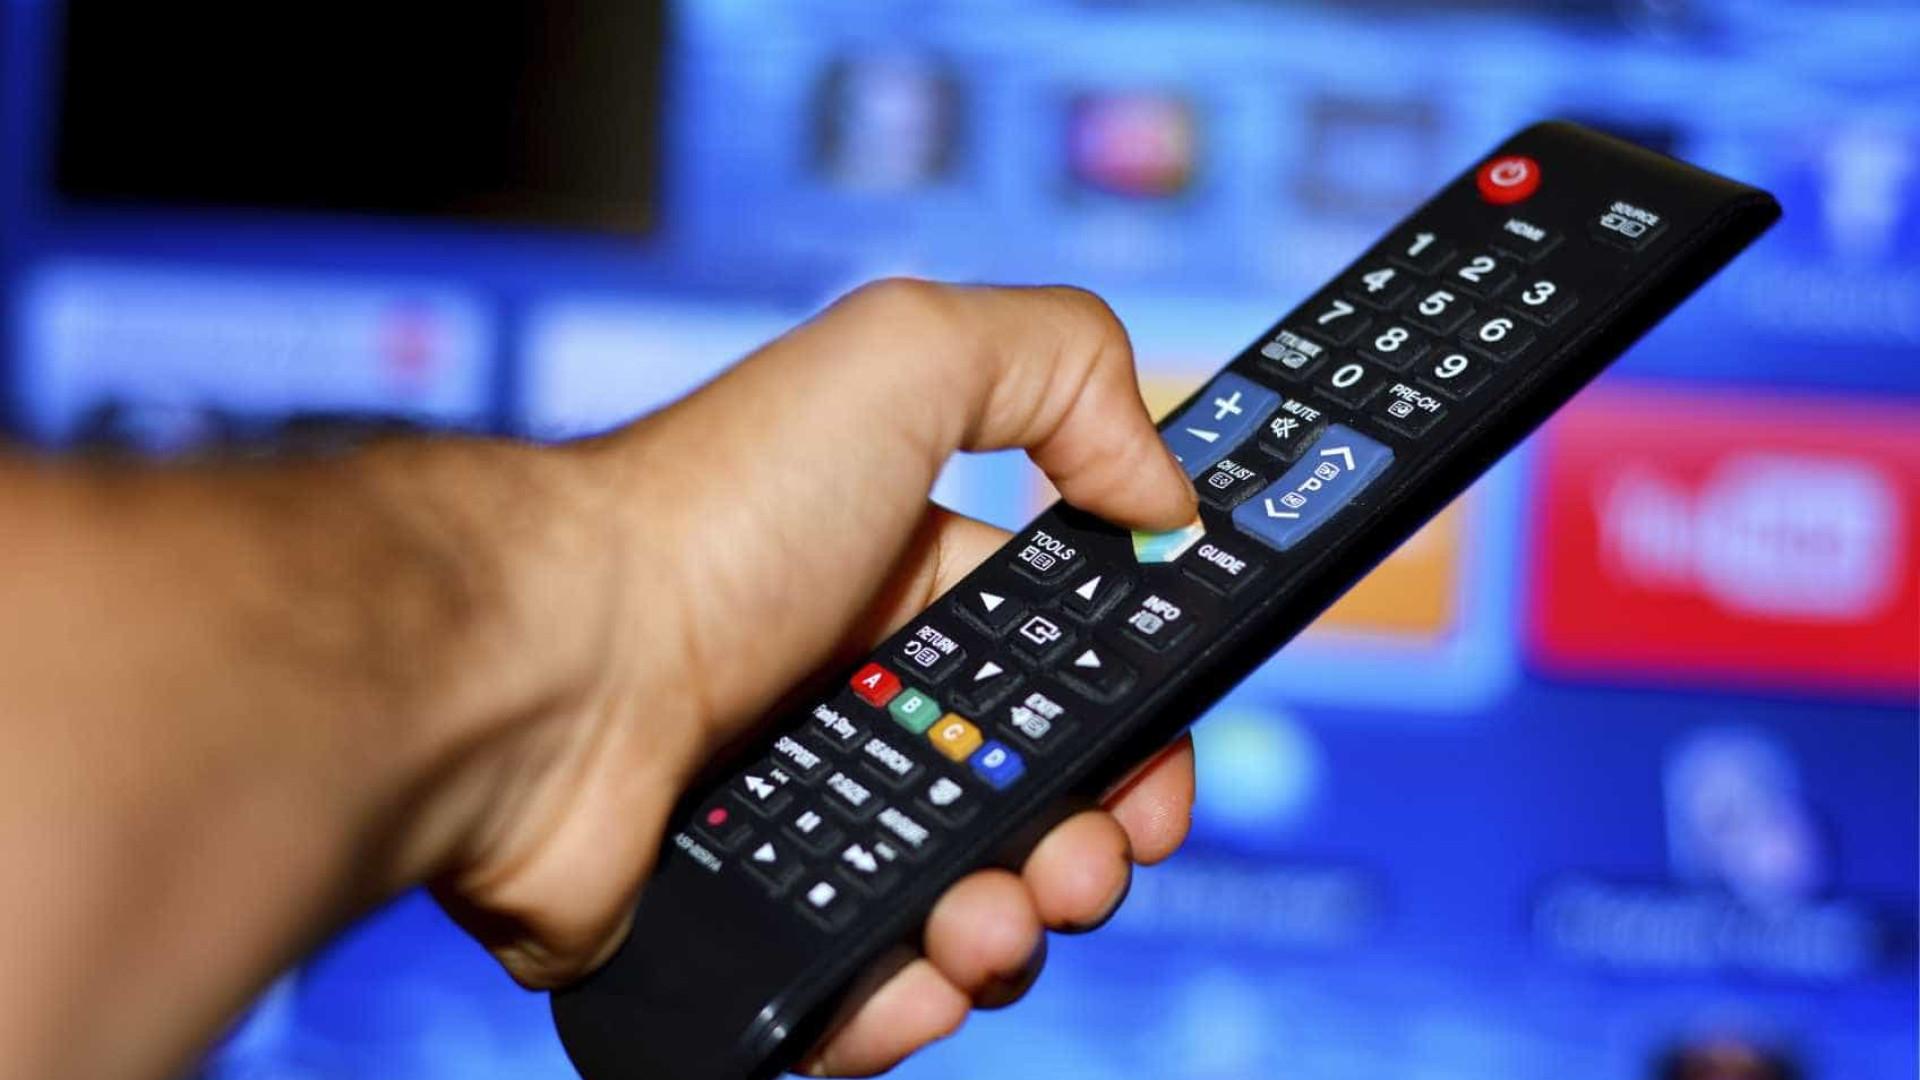 Bloco apresenta proposta para recuperar domínio público da rede da TDT